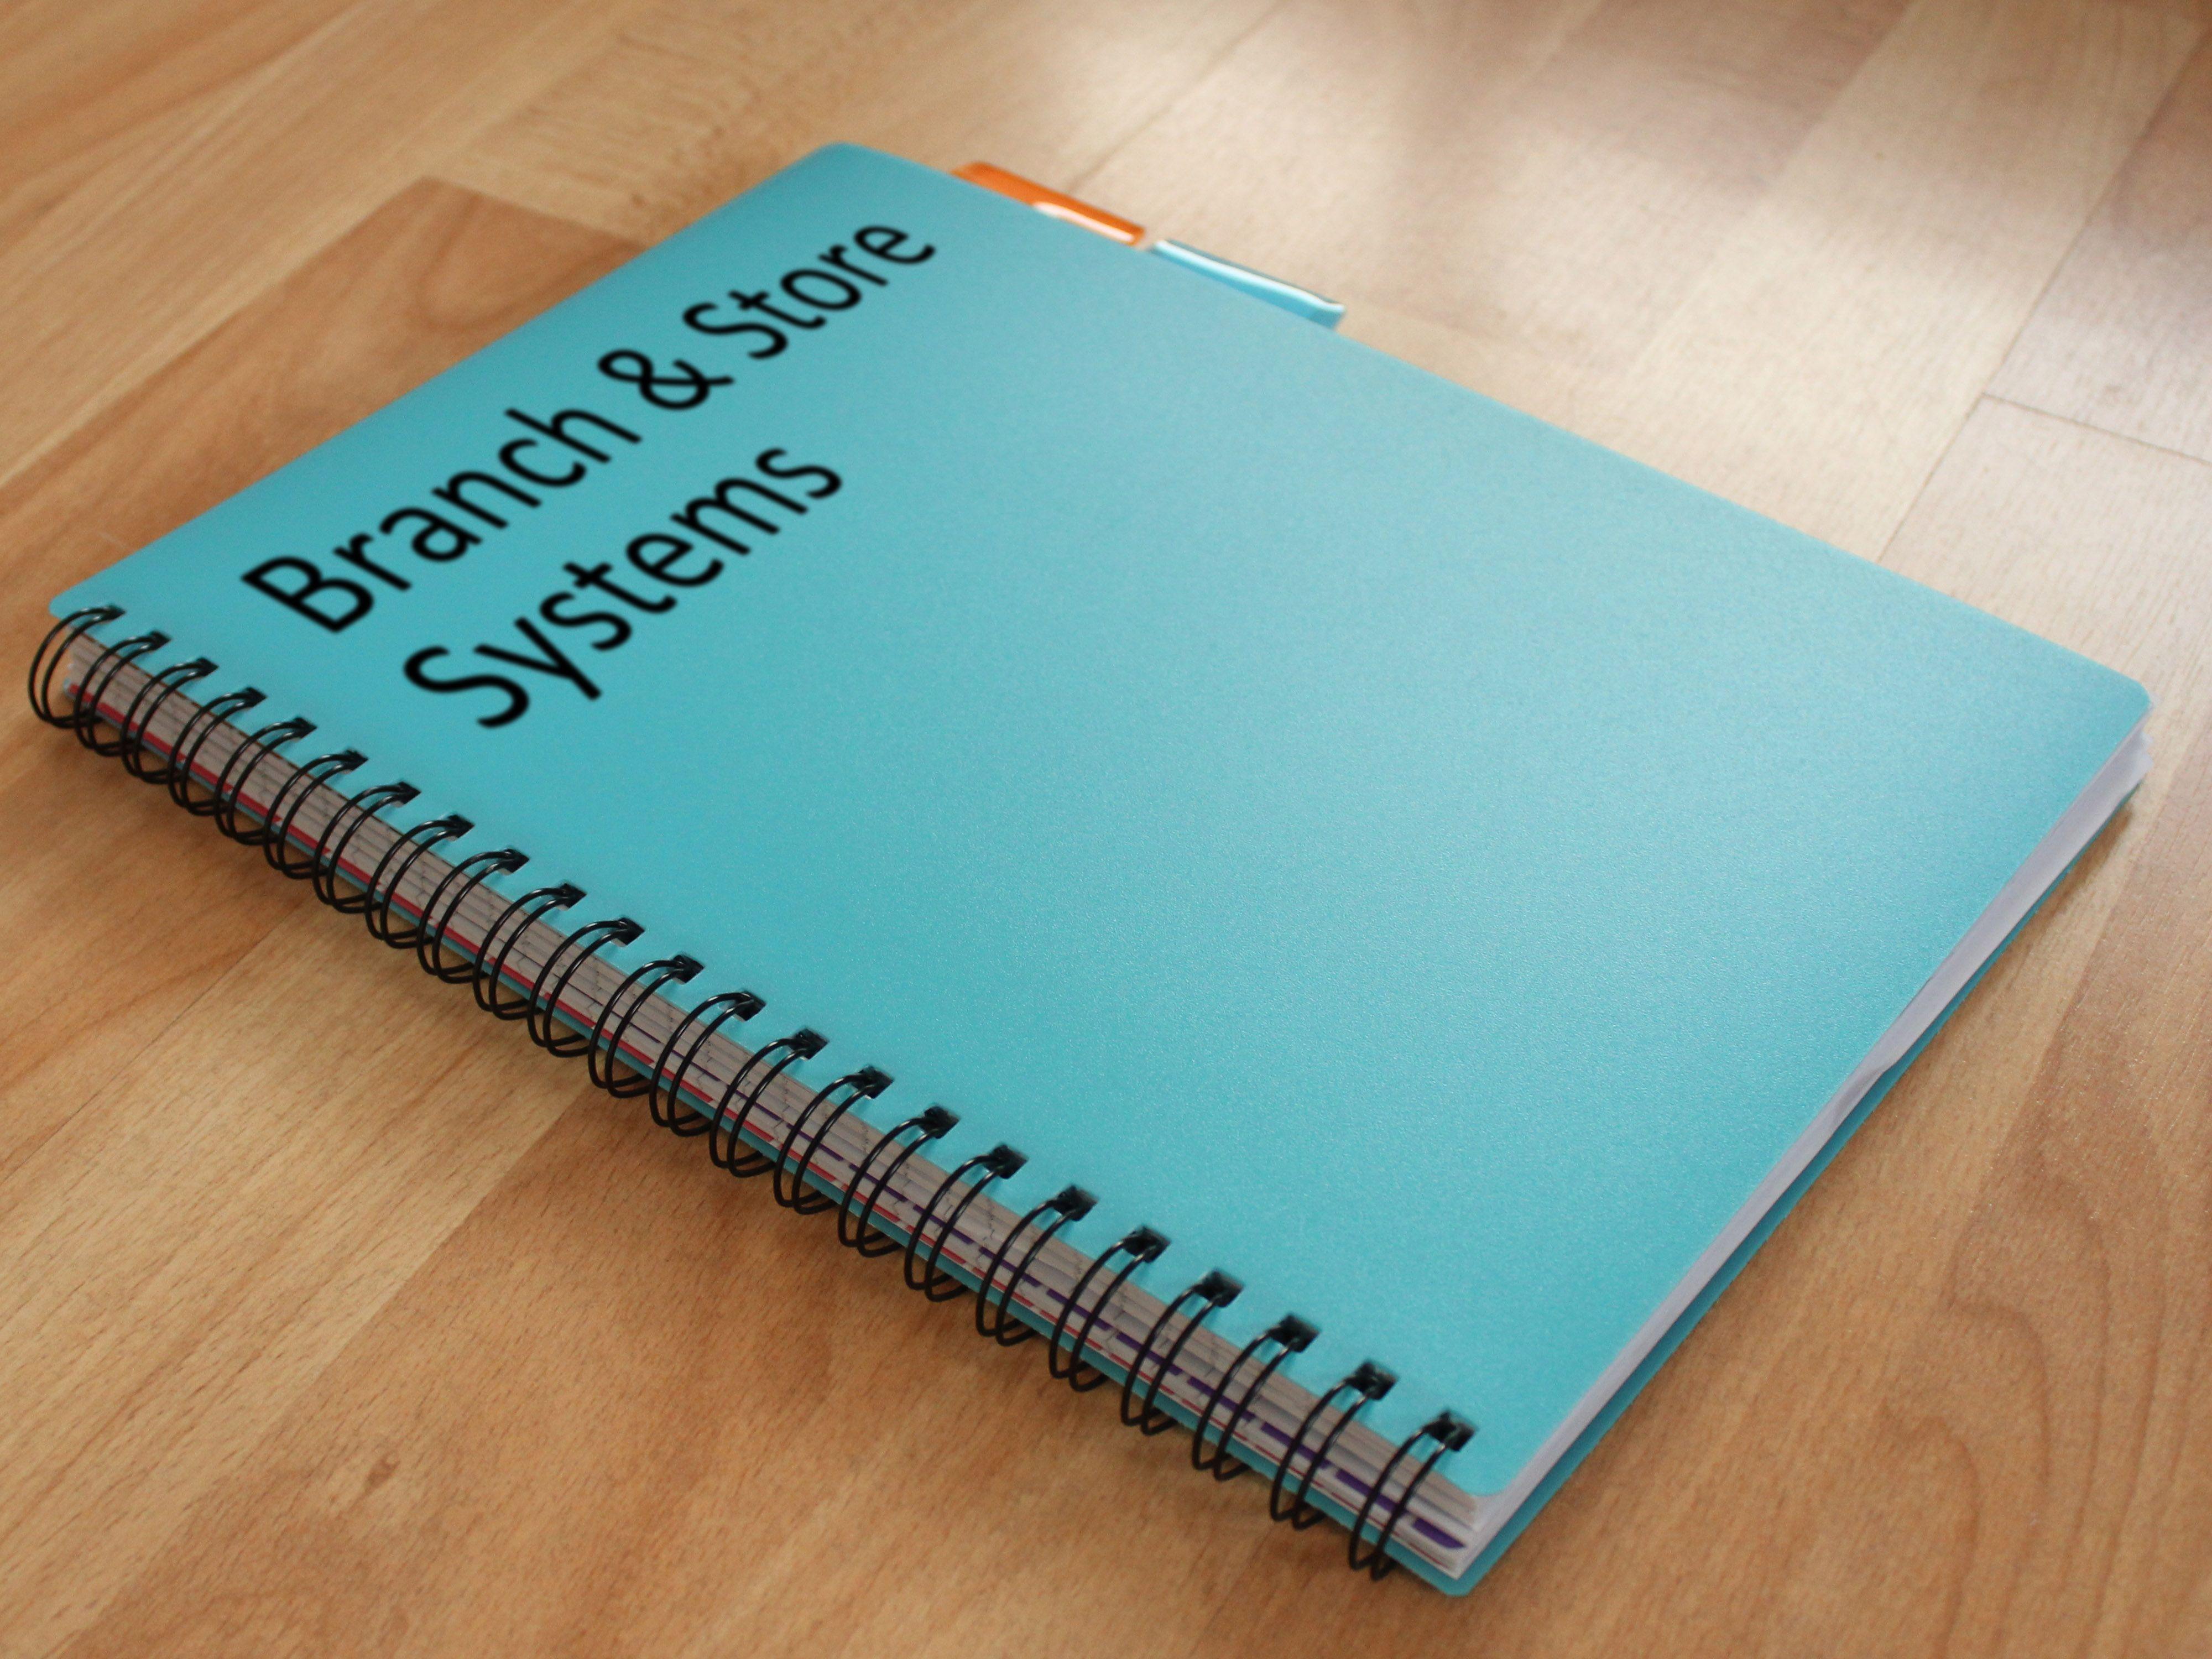 Write A Business Process Document A Business And Business - How to write a business process document